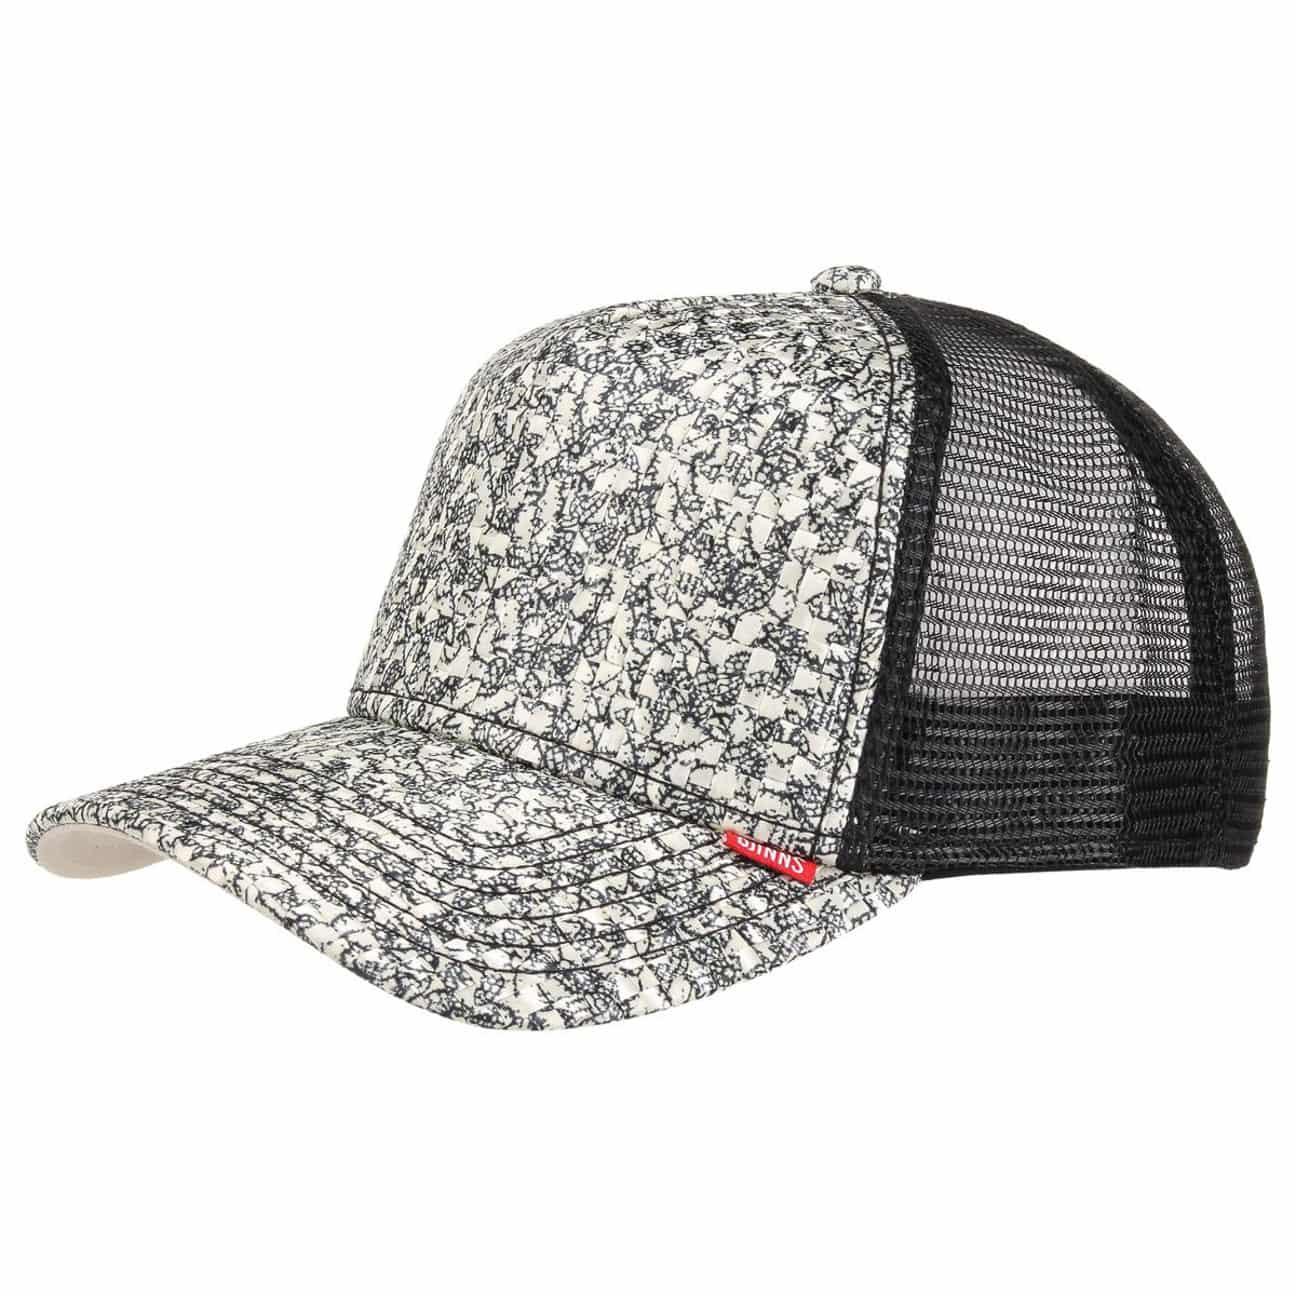 hft shifted trucker cap 2 by djinns eur 19 99 hats. Black Bedroom Furniture Sets. Home Design Ideas